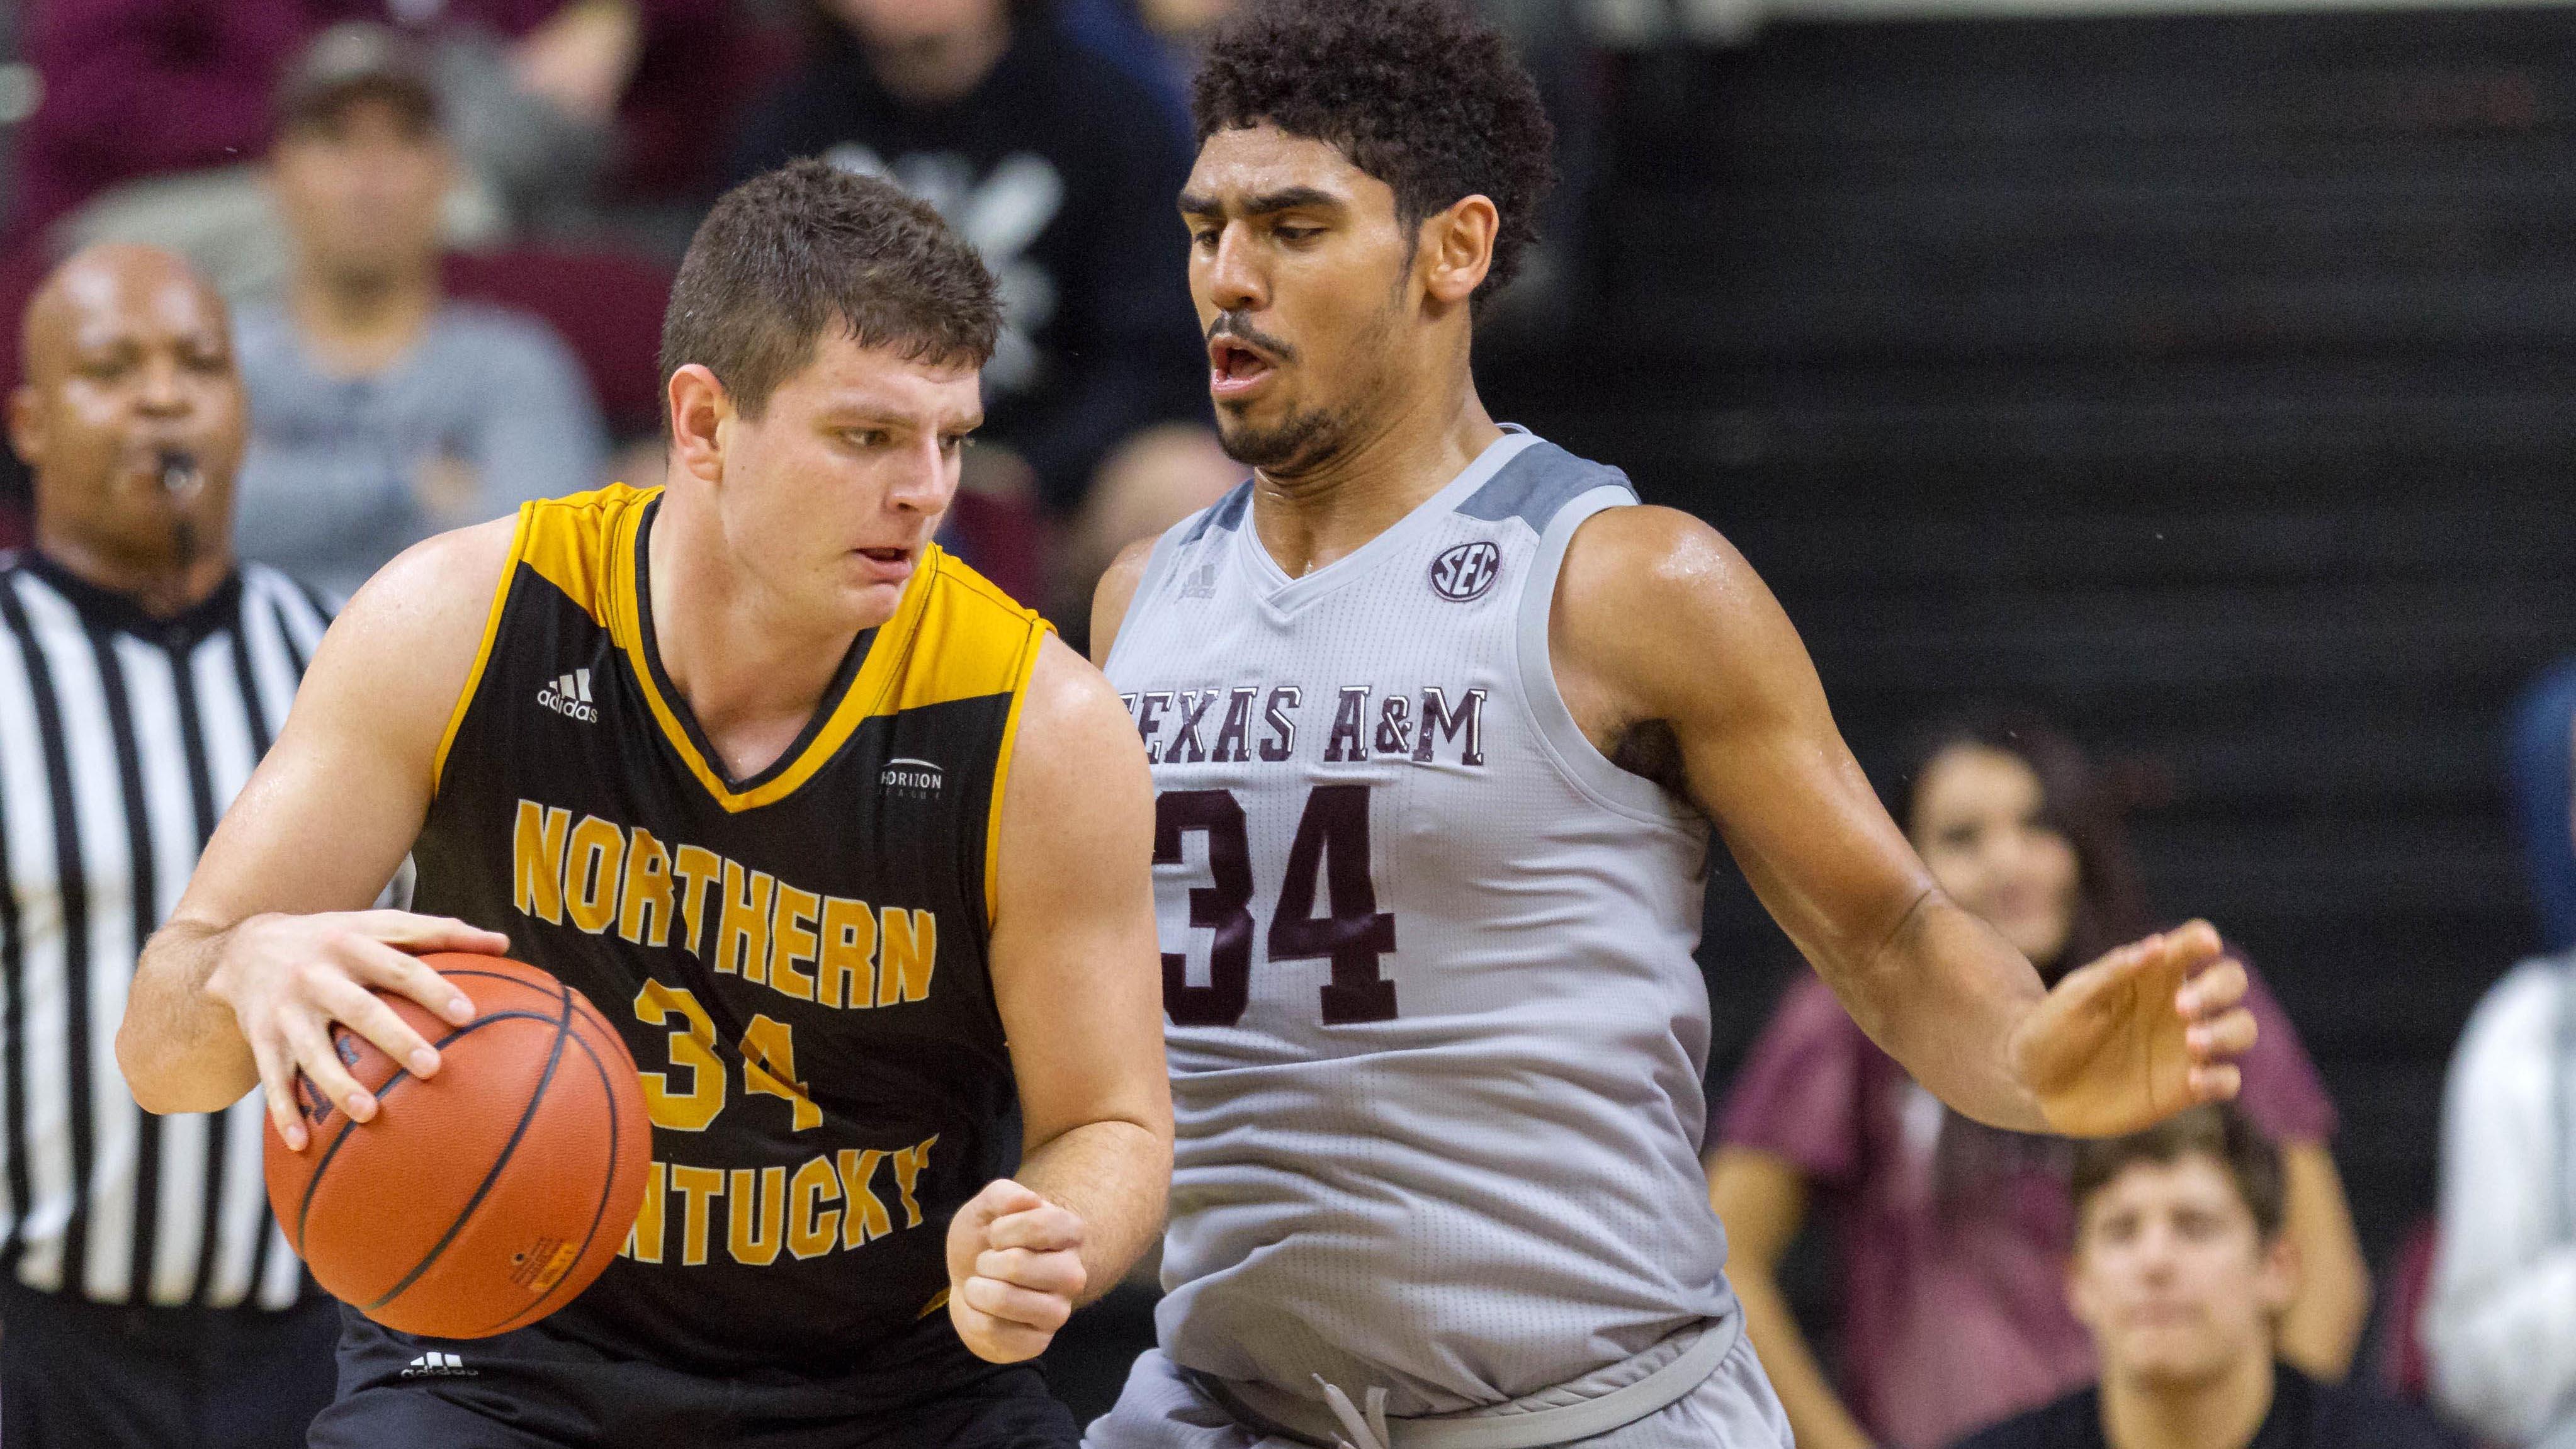 Northern Kentucky's Drew McDonald backs down a defender